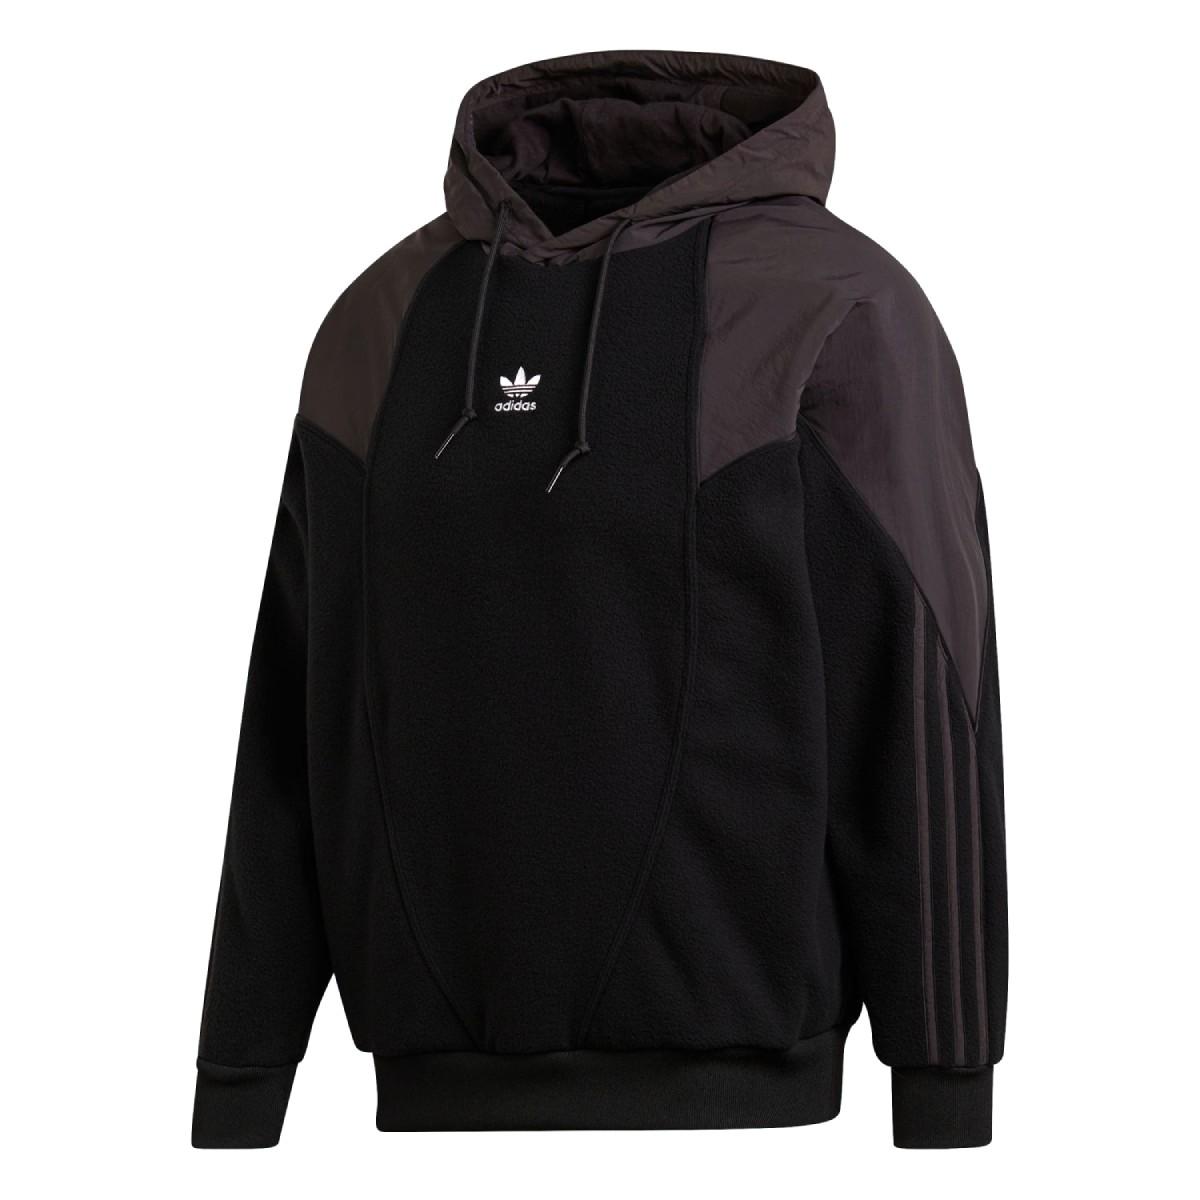 adidas BG TRF MIX HOODIE アディダス ビッグ トレフォイル ポーラーフリース ミックス フーディー BLACK ge0863